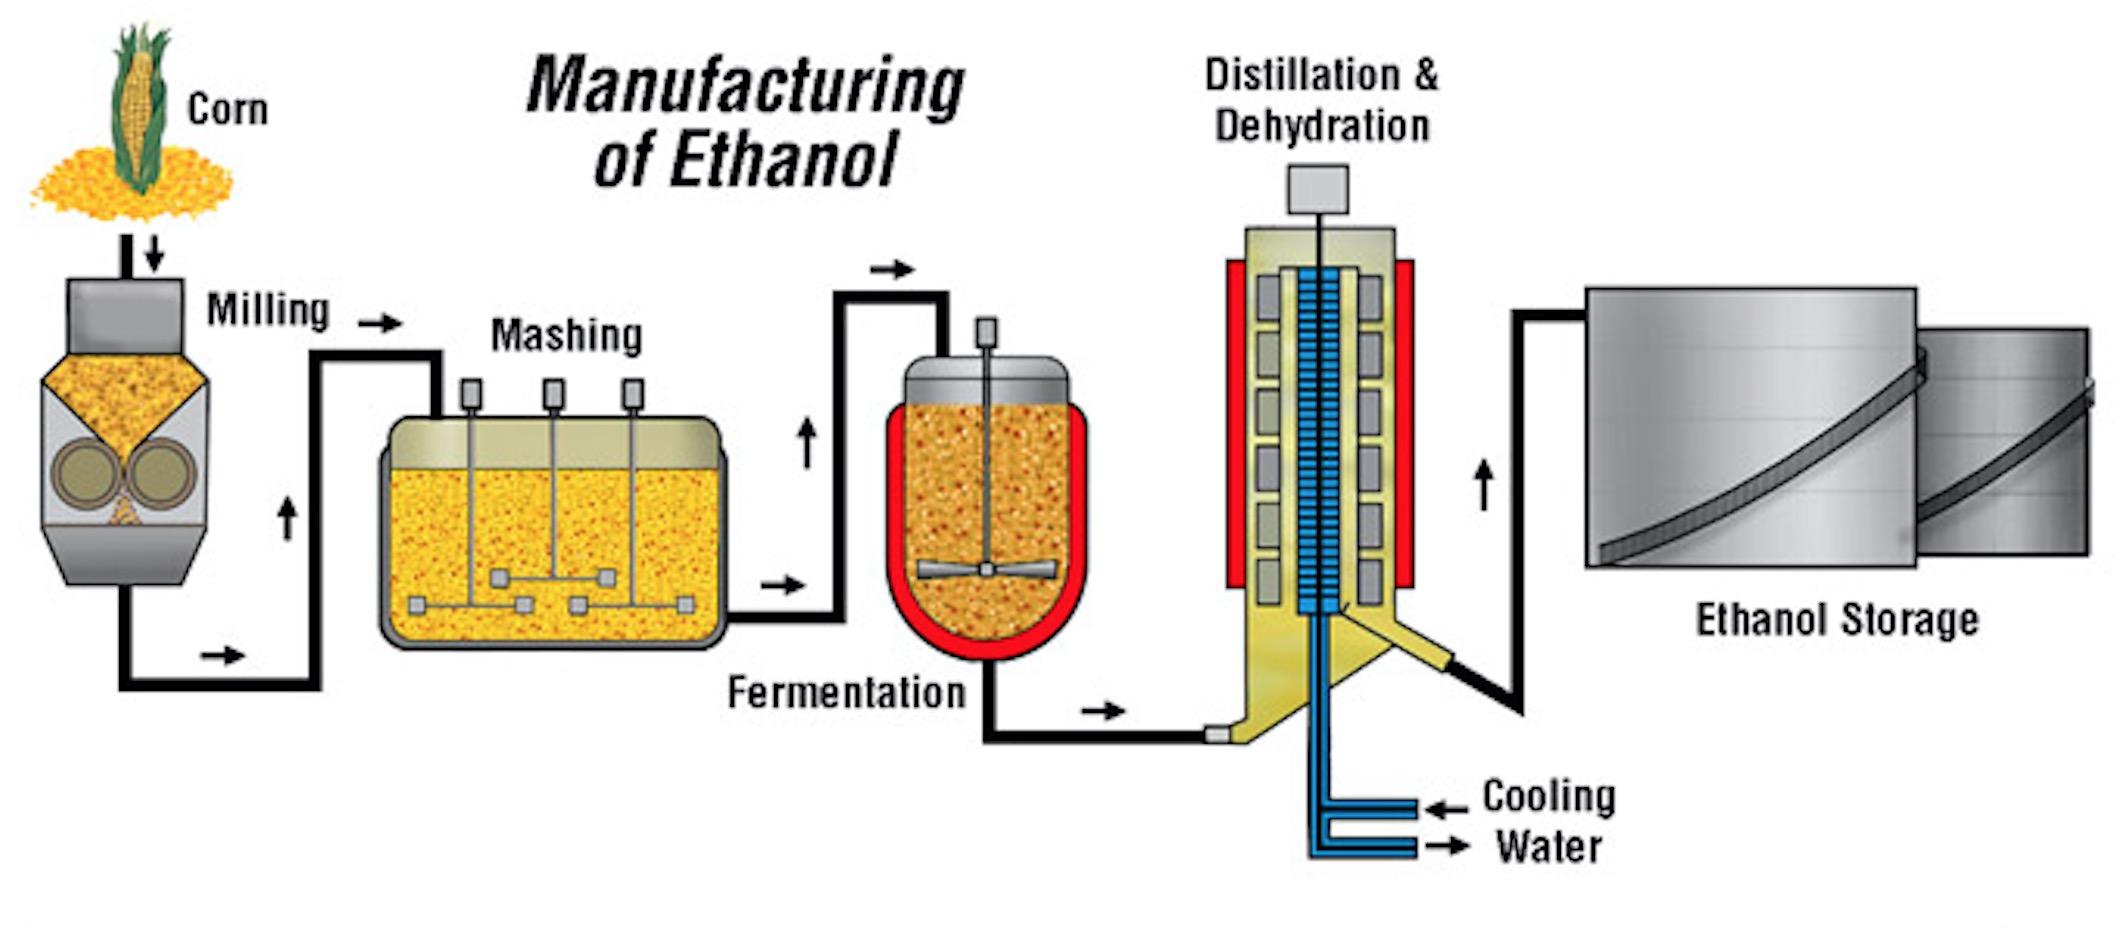 http://www.heat-inc.com/Heating_Industry_Applications/ManufacturingEthanol/Ethenol1full.jpg